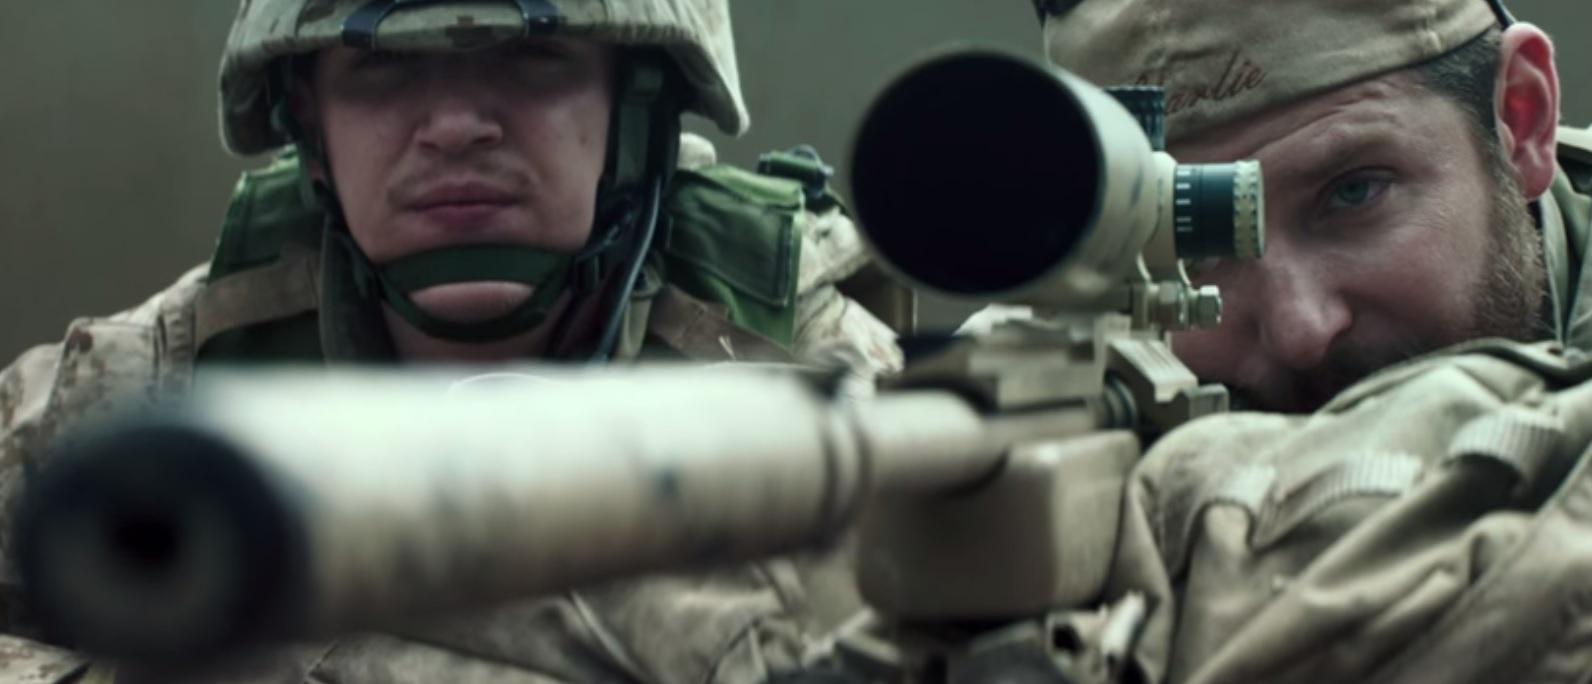 The Guns of 'American Sniper' | OutdoorHub